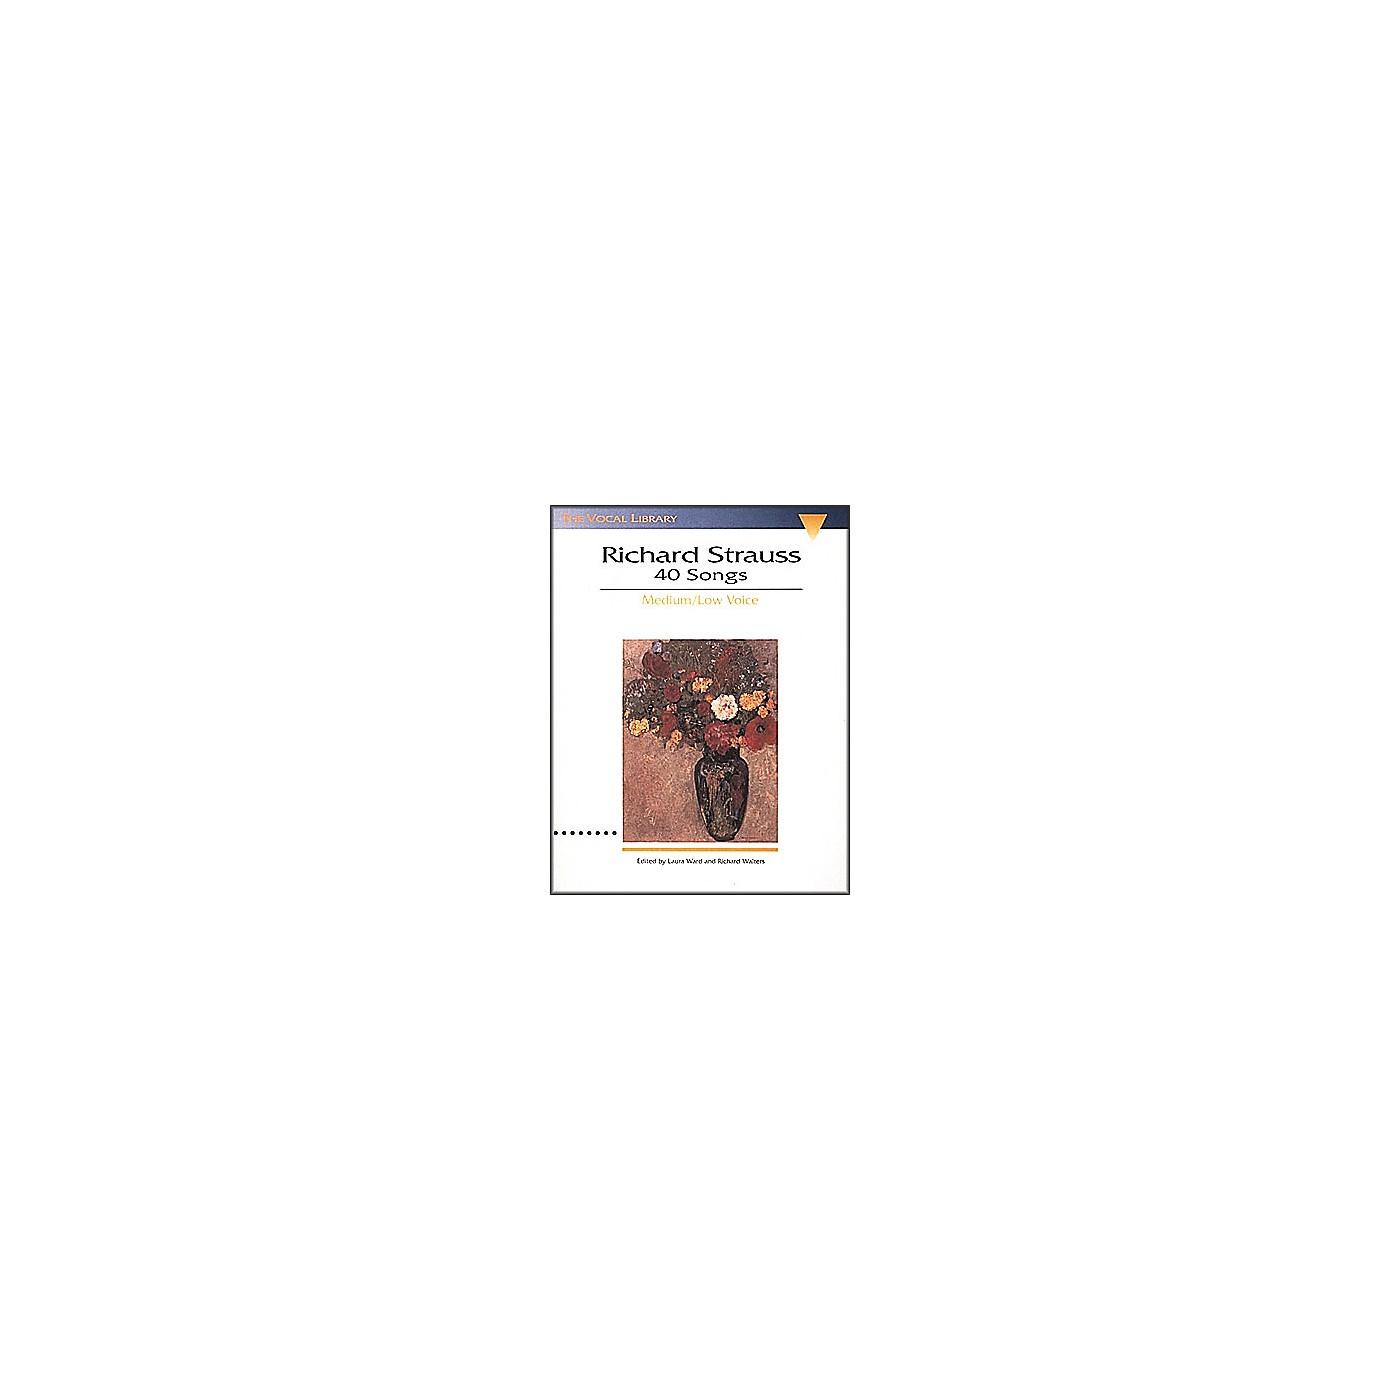 Hal Leonard Songs Of Richard Strauss - 40 Songs for Medium / Low Voice thumbnail